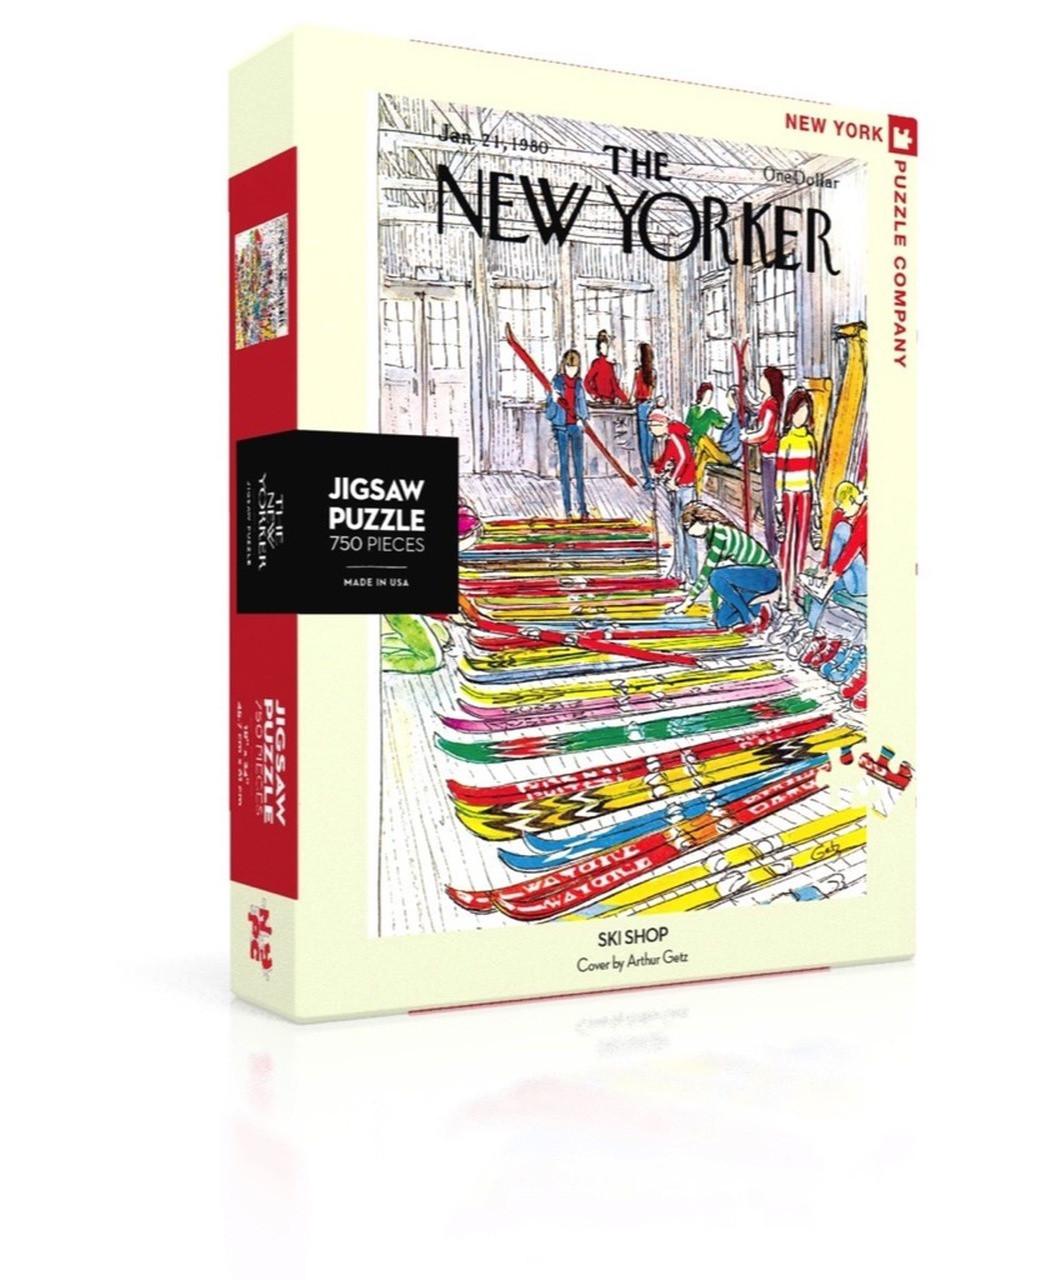 THE NEW YORKER SKI SHOP